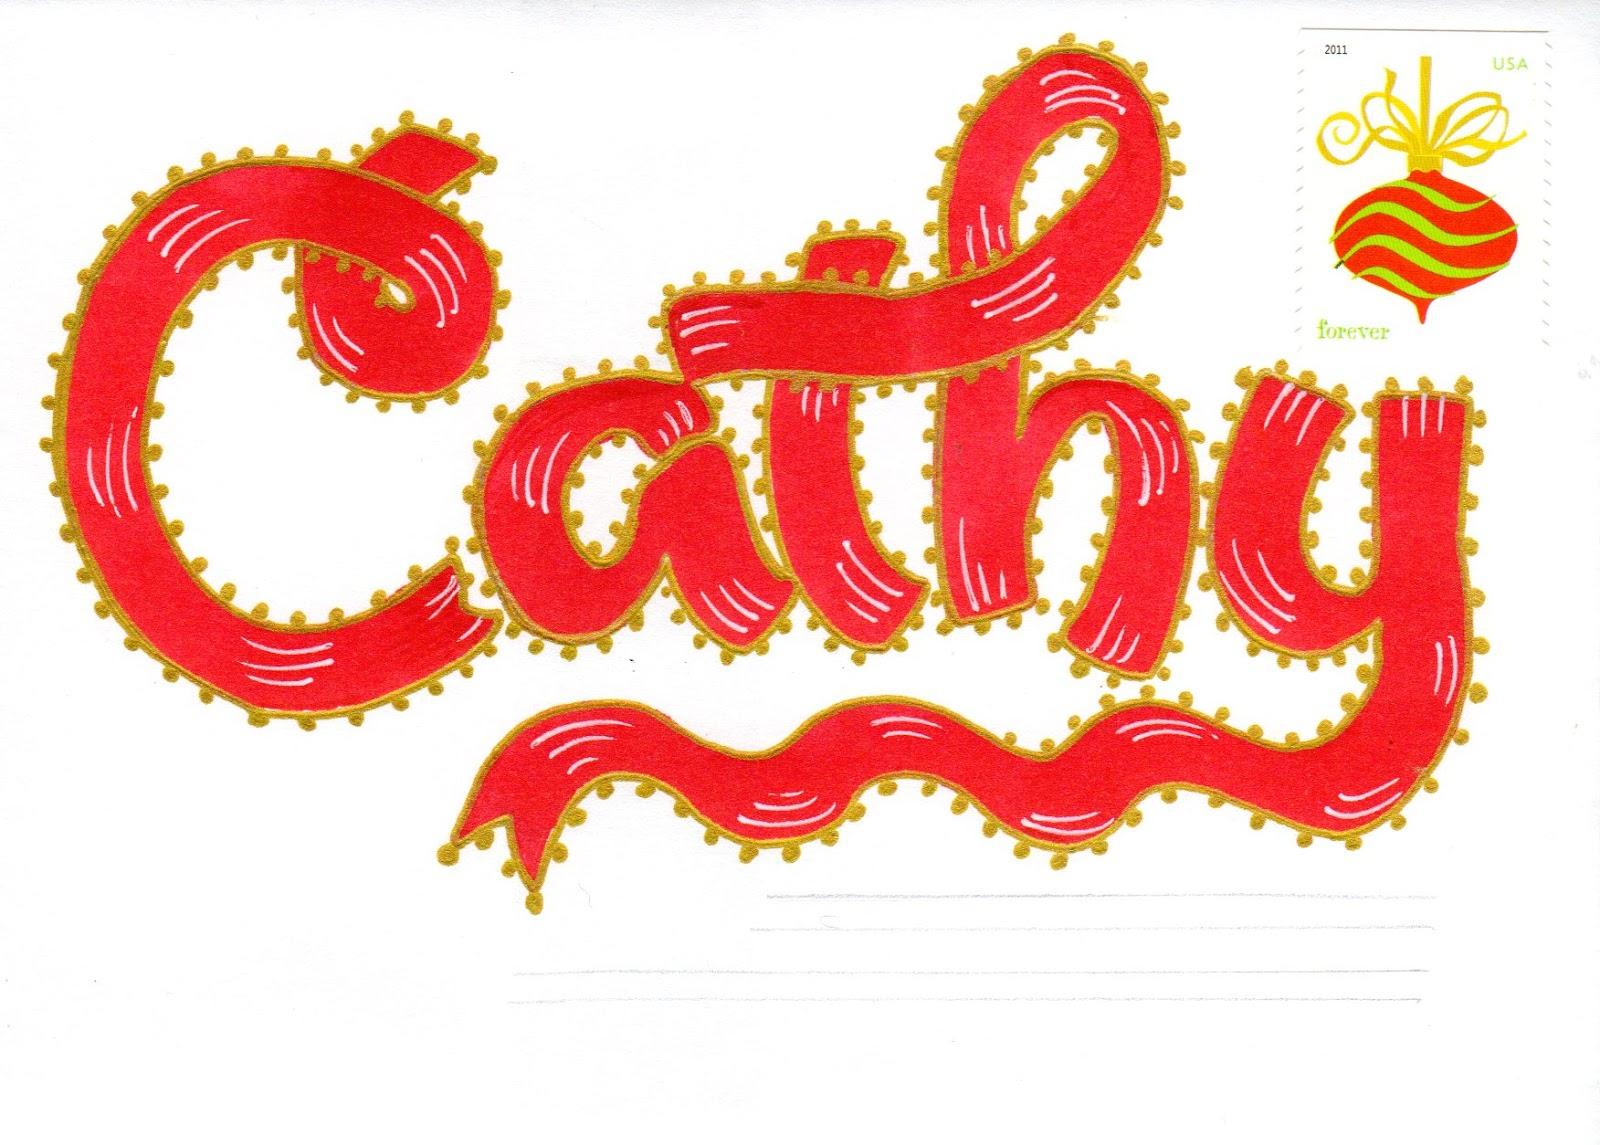 Cathy Name